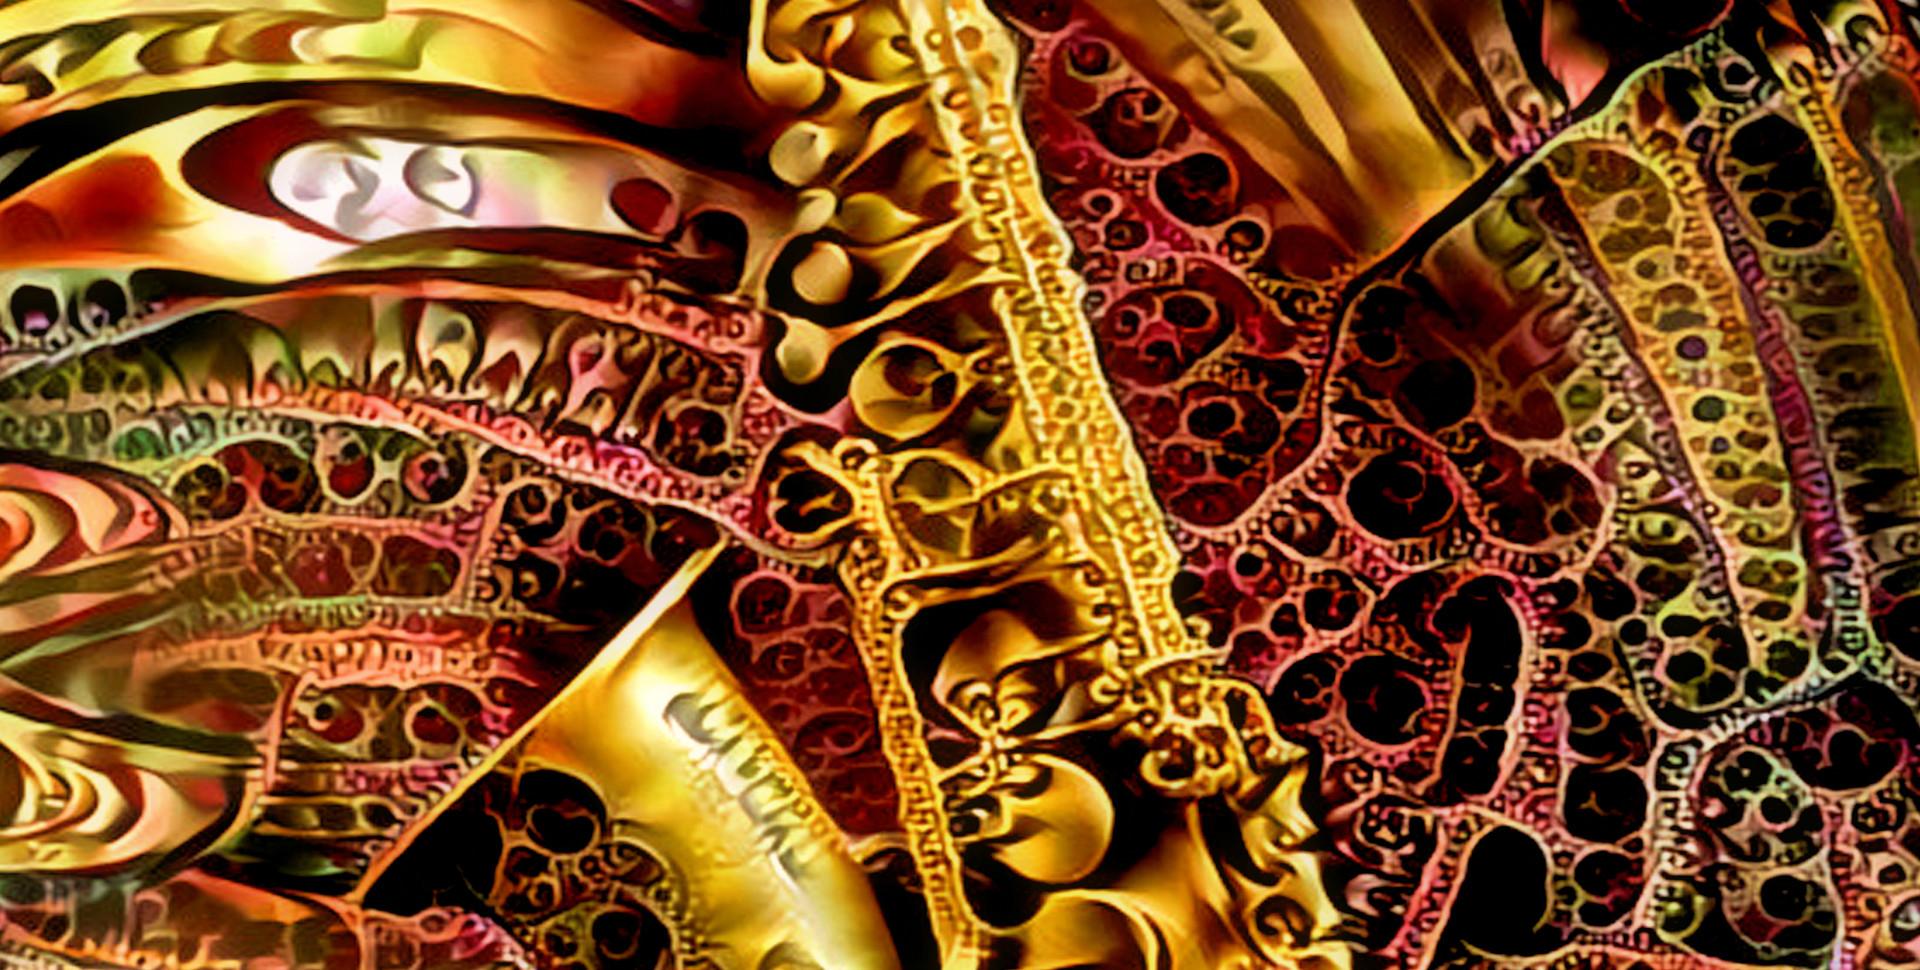 Ornamental Saxophon